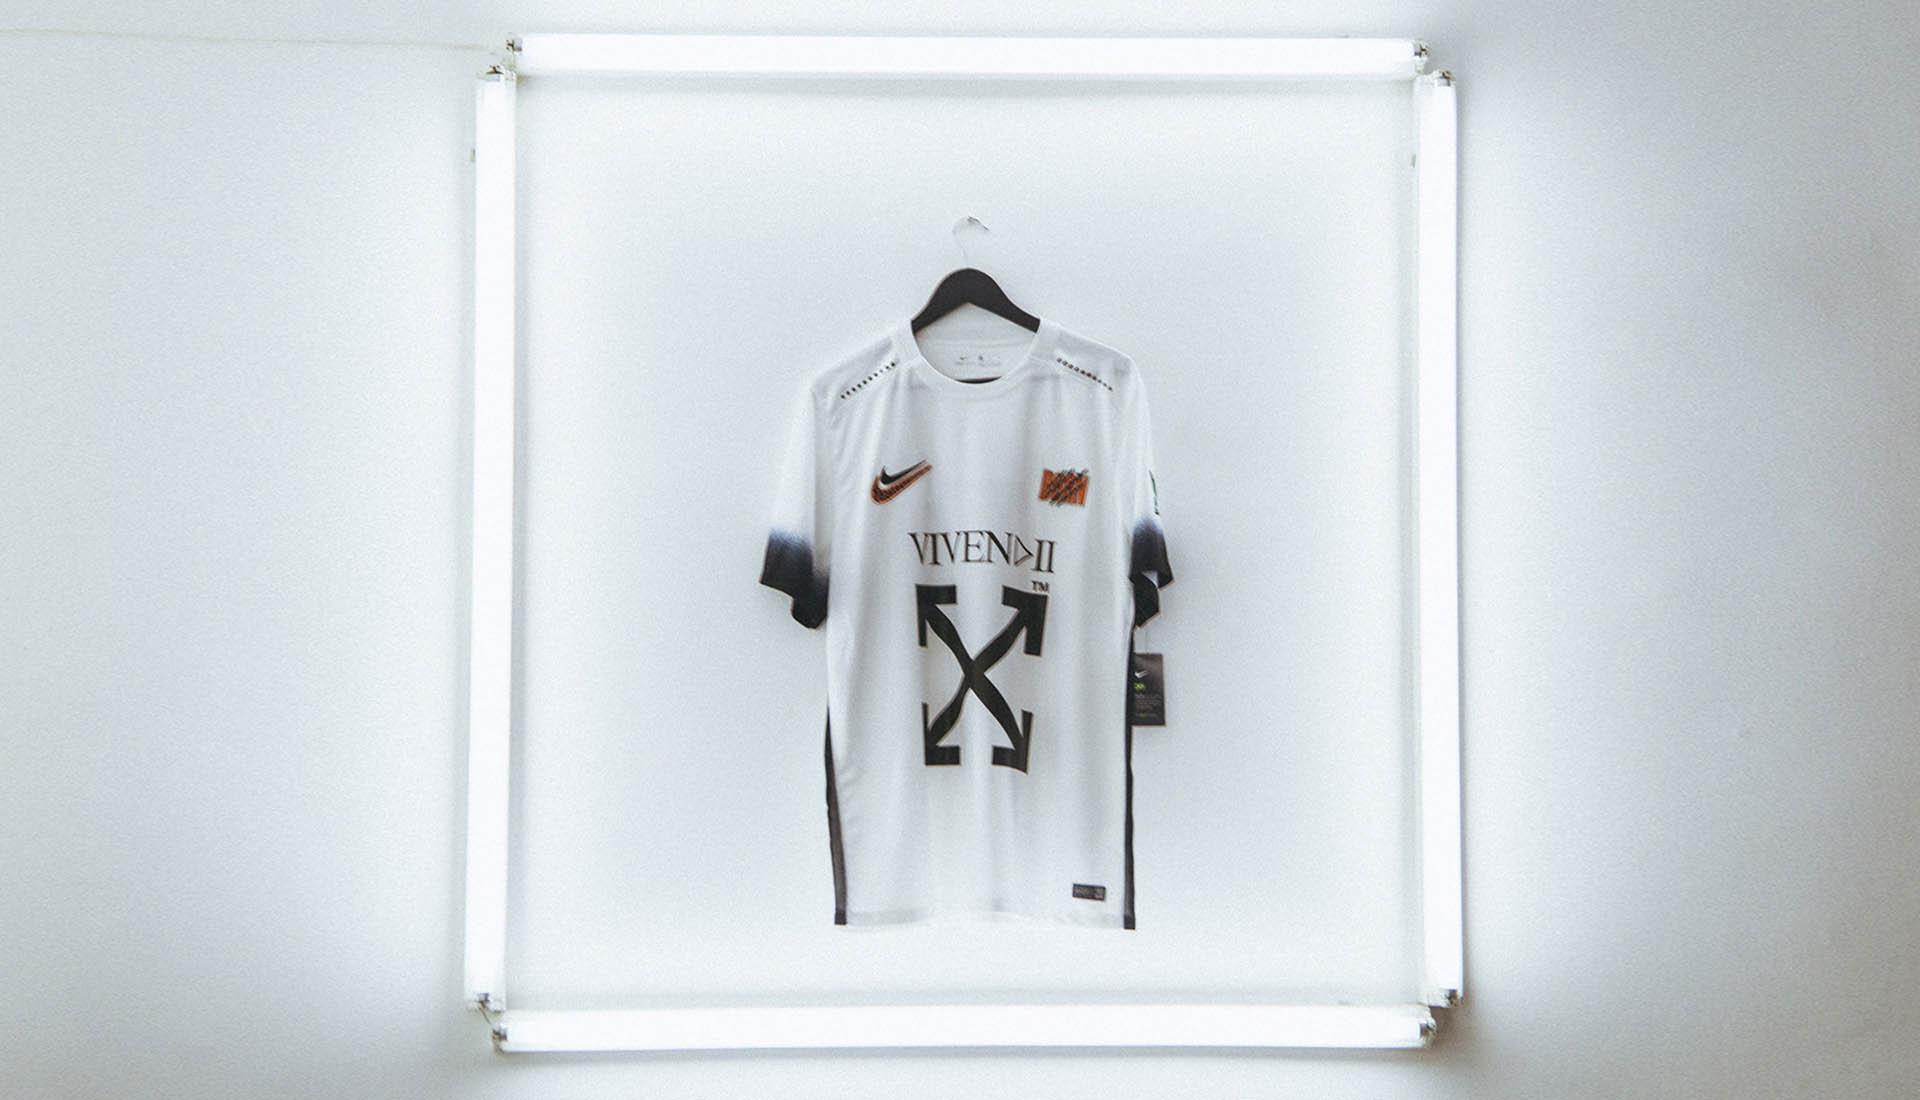 6859dcb8457 Off-White x Vivendii Showcase Exclusive Nike Football Shirt - SoccerBible.